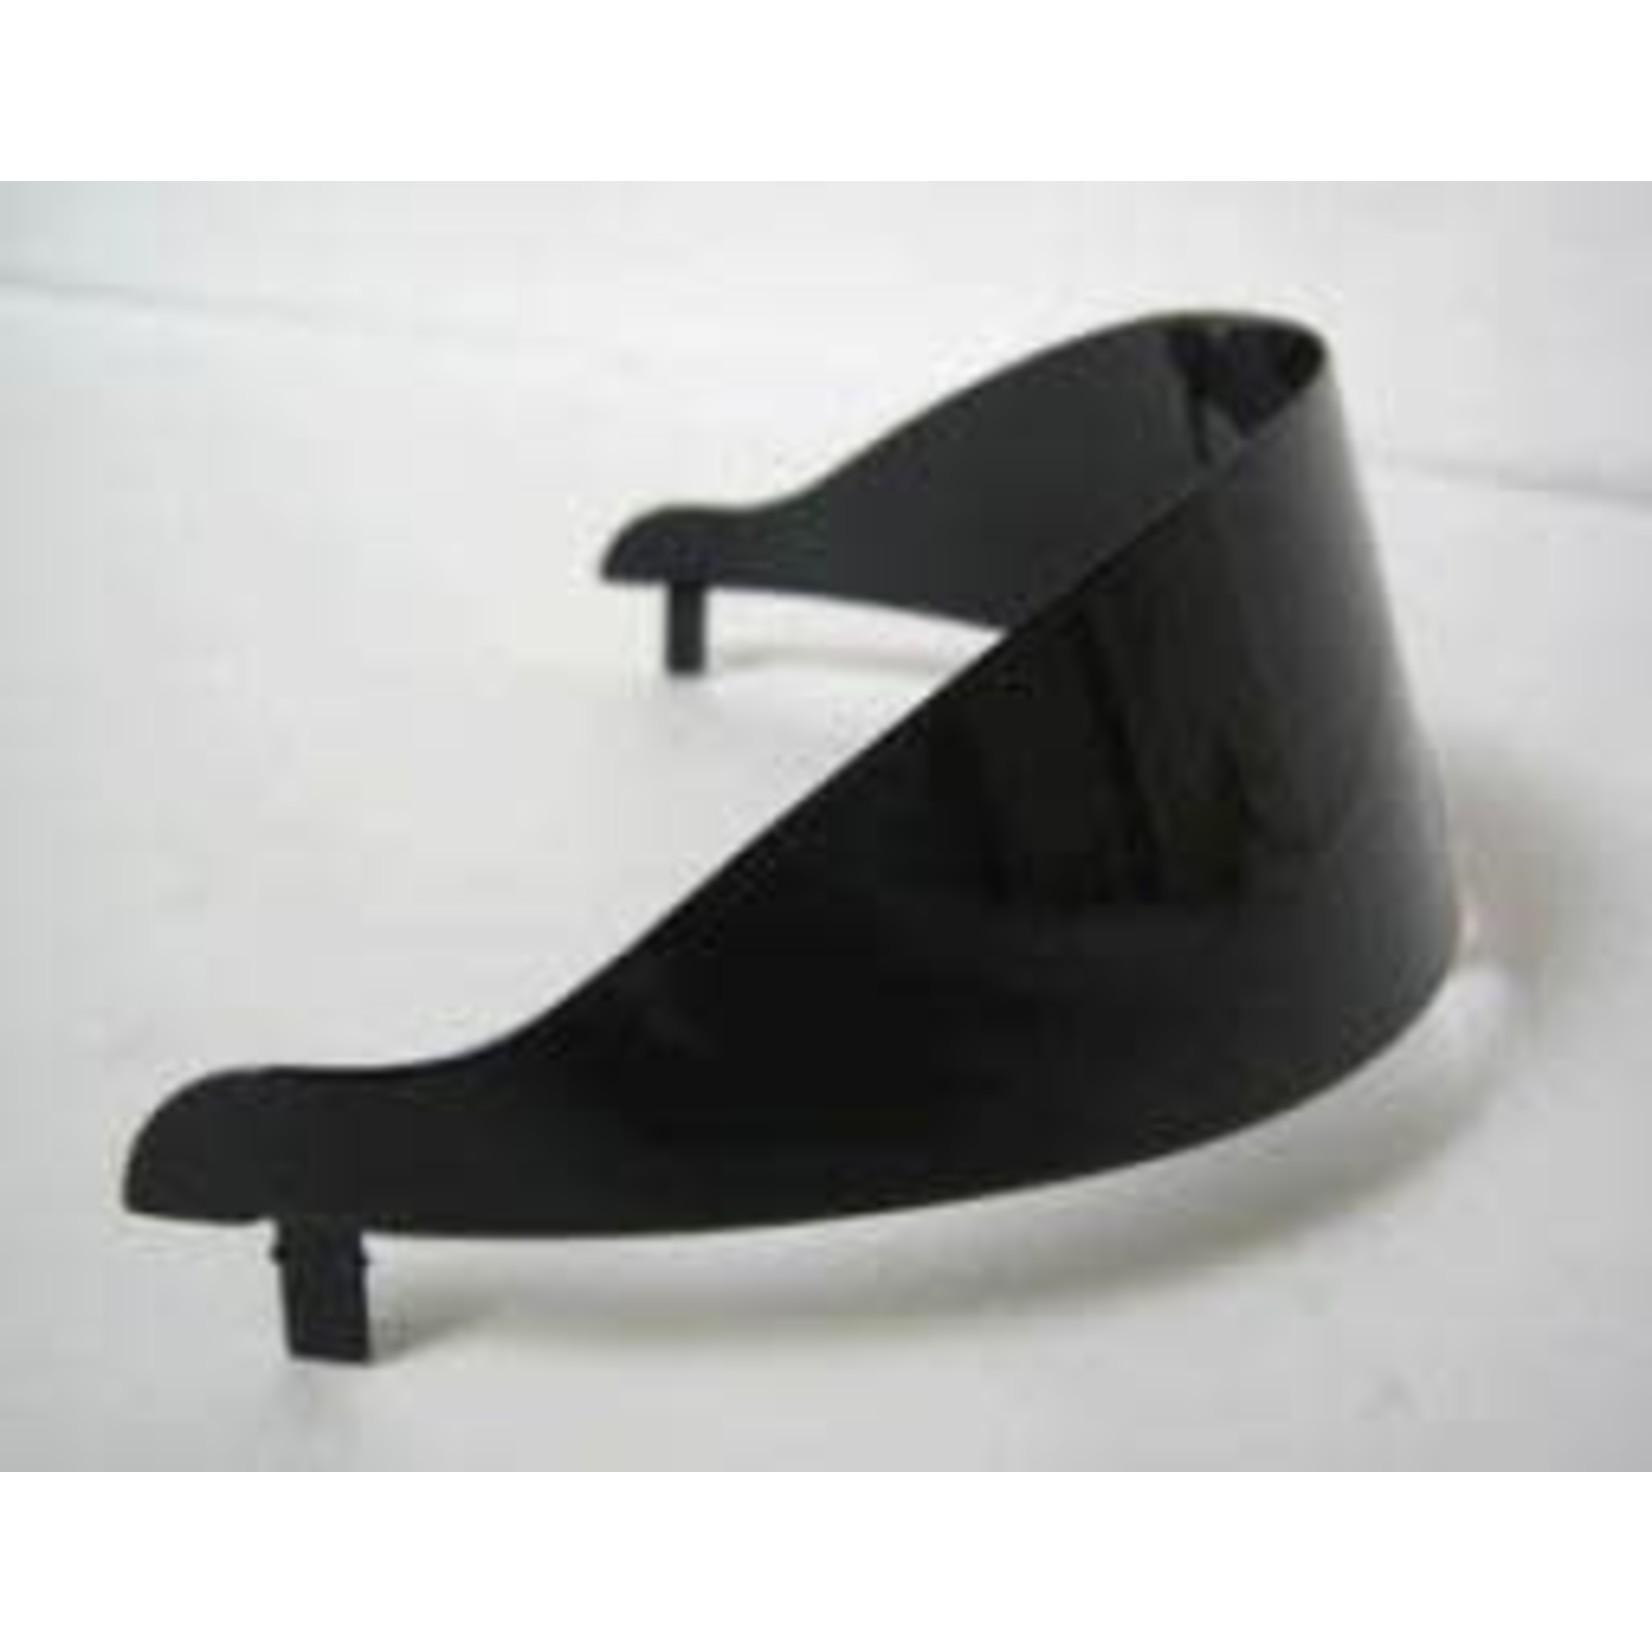 Accessories Headlamp Visor, Black Gloss GTS/LX Small